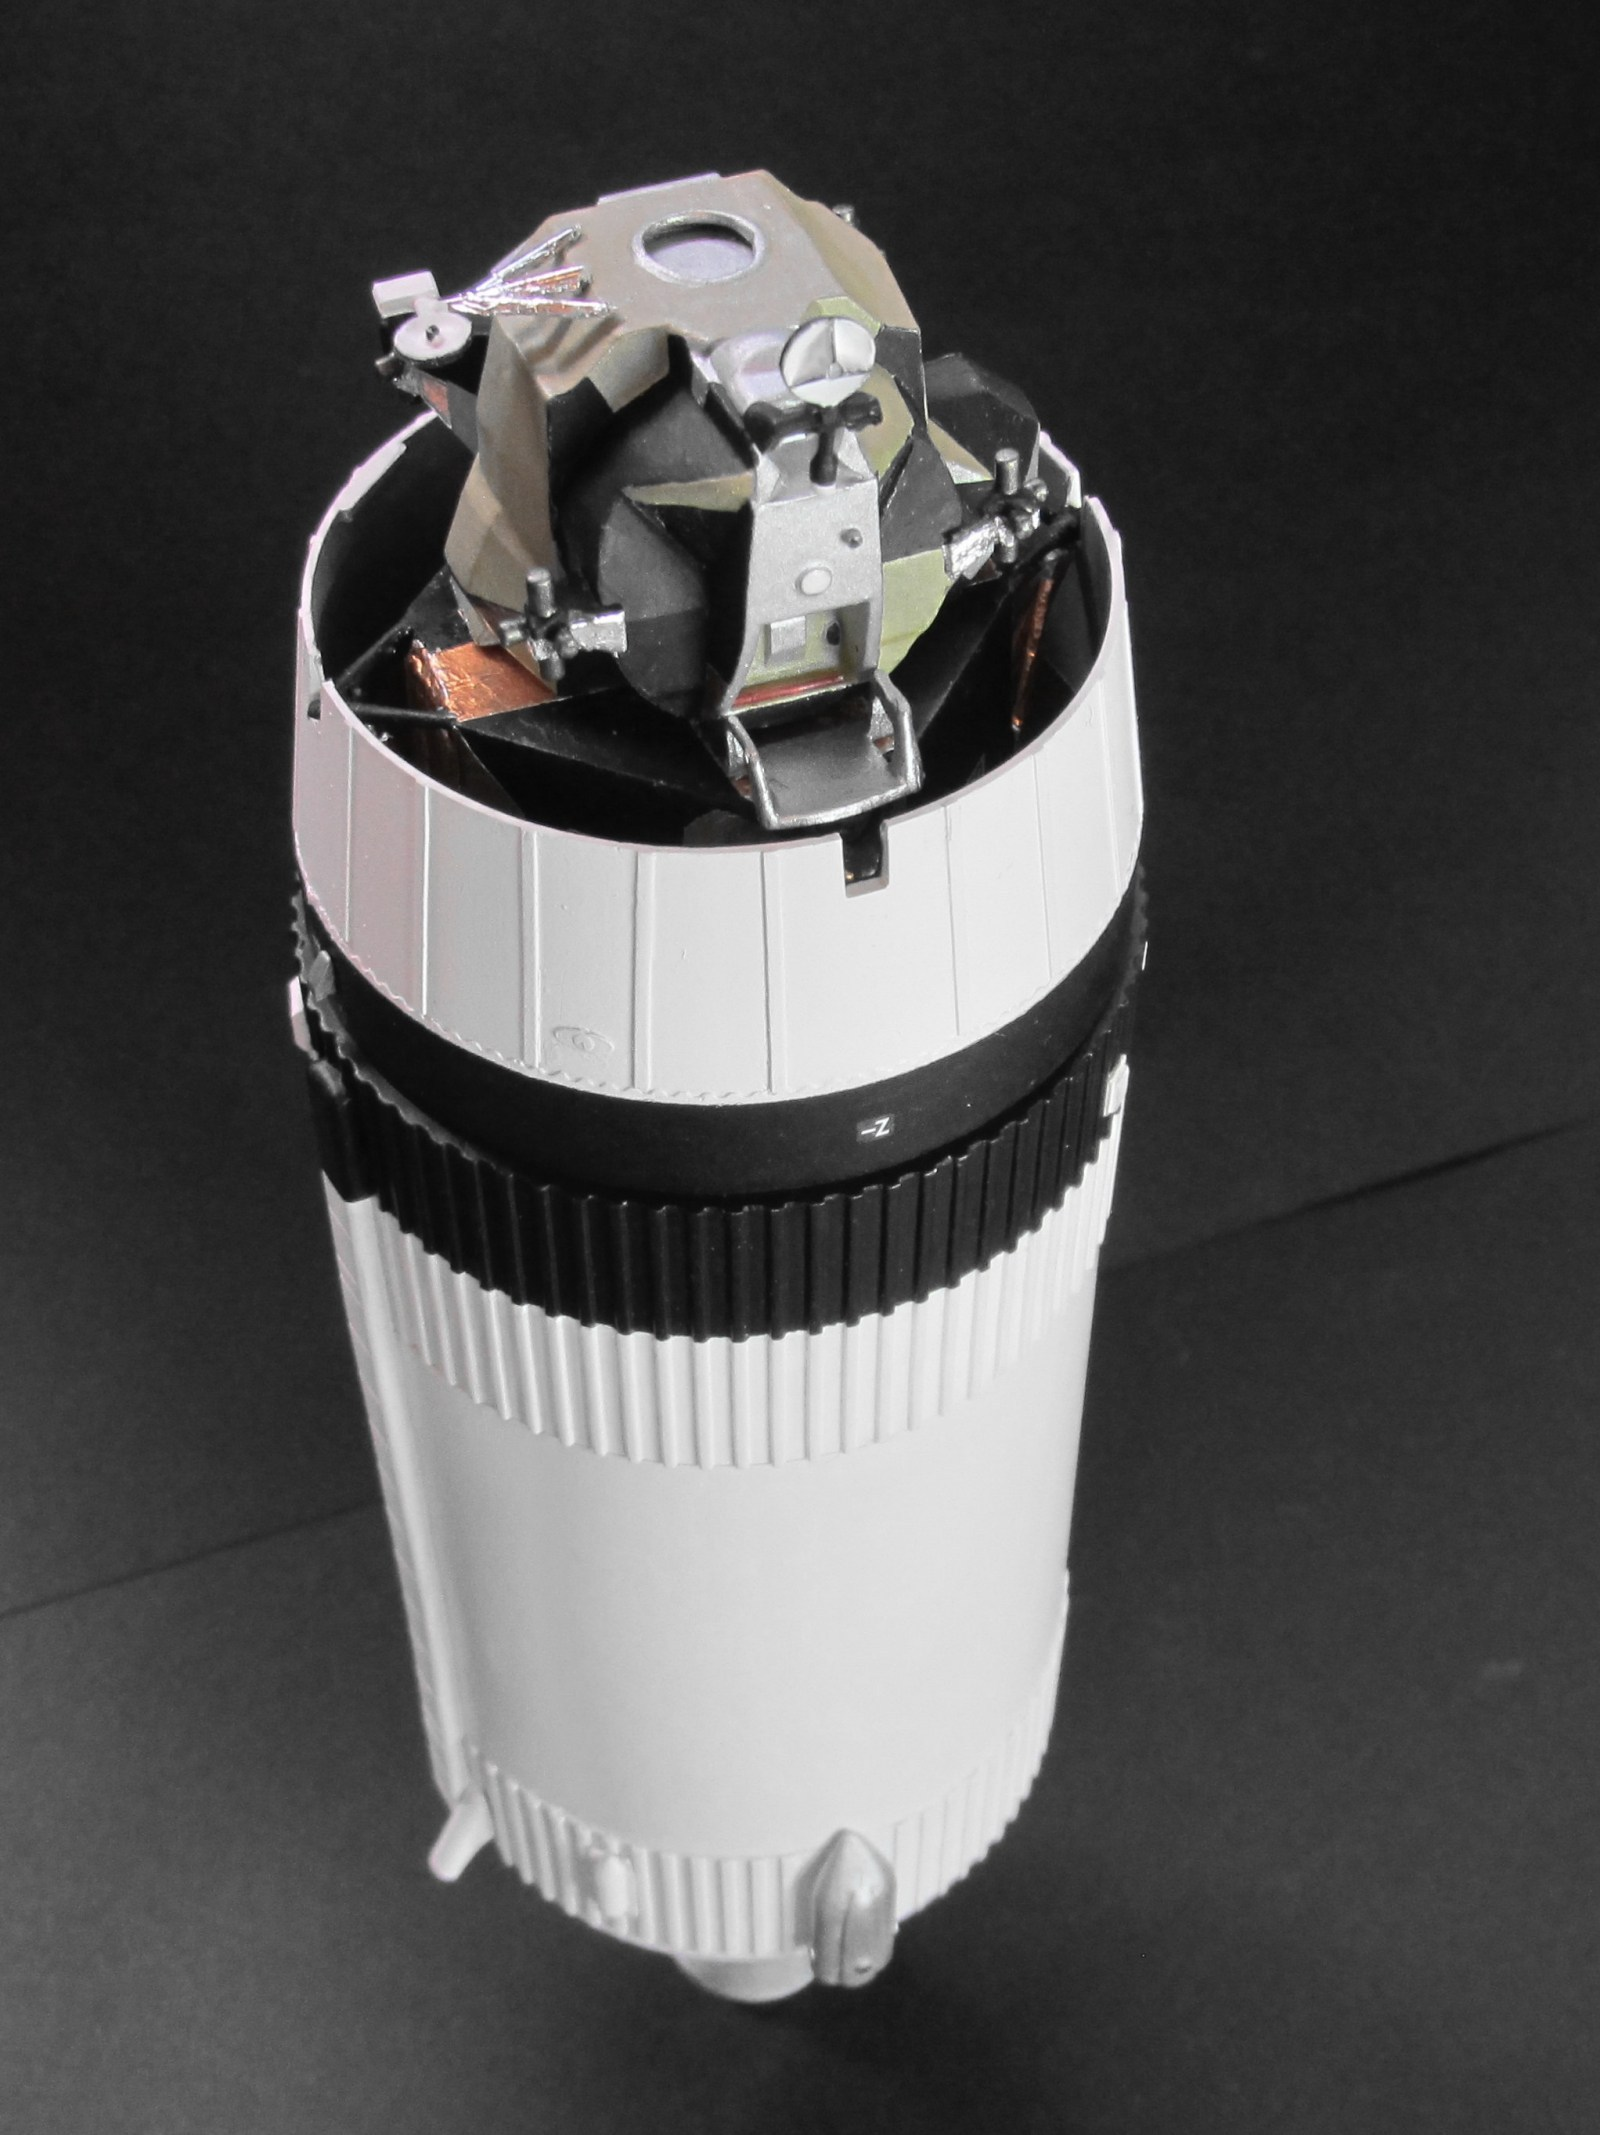 Click image for larger version.  Name:lunar module 4.jpg Views:9 Size:354.4 KB ID:24368